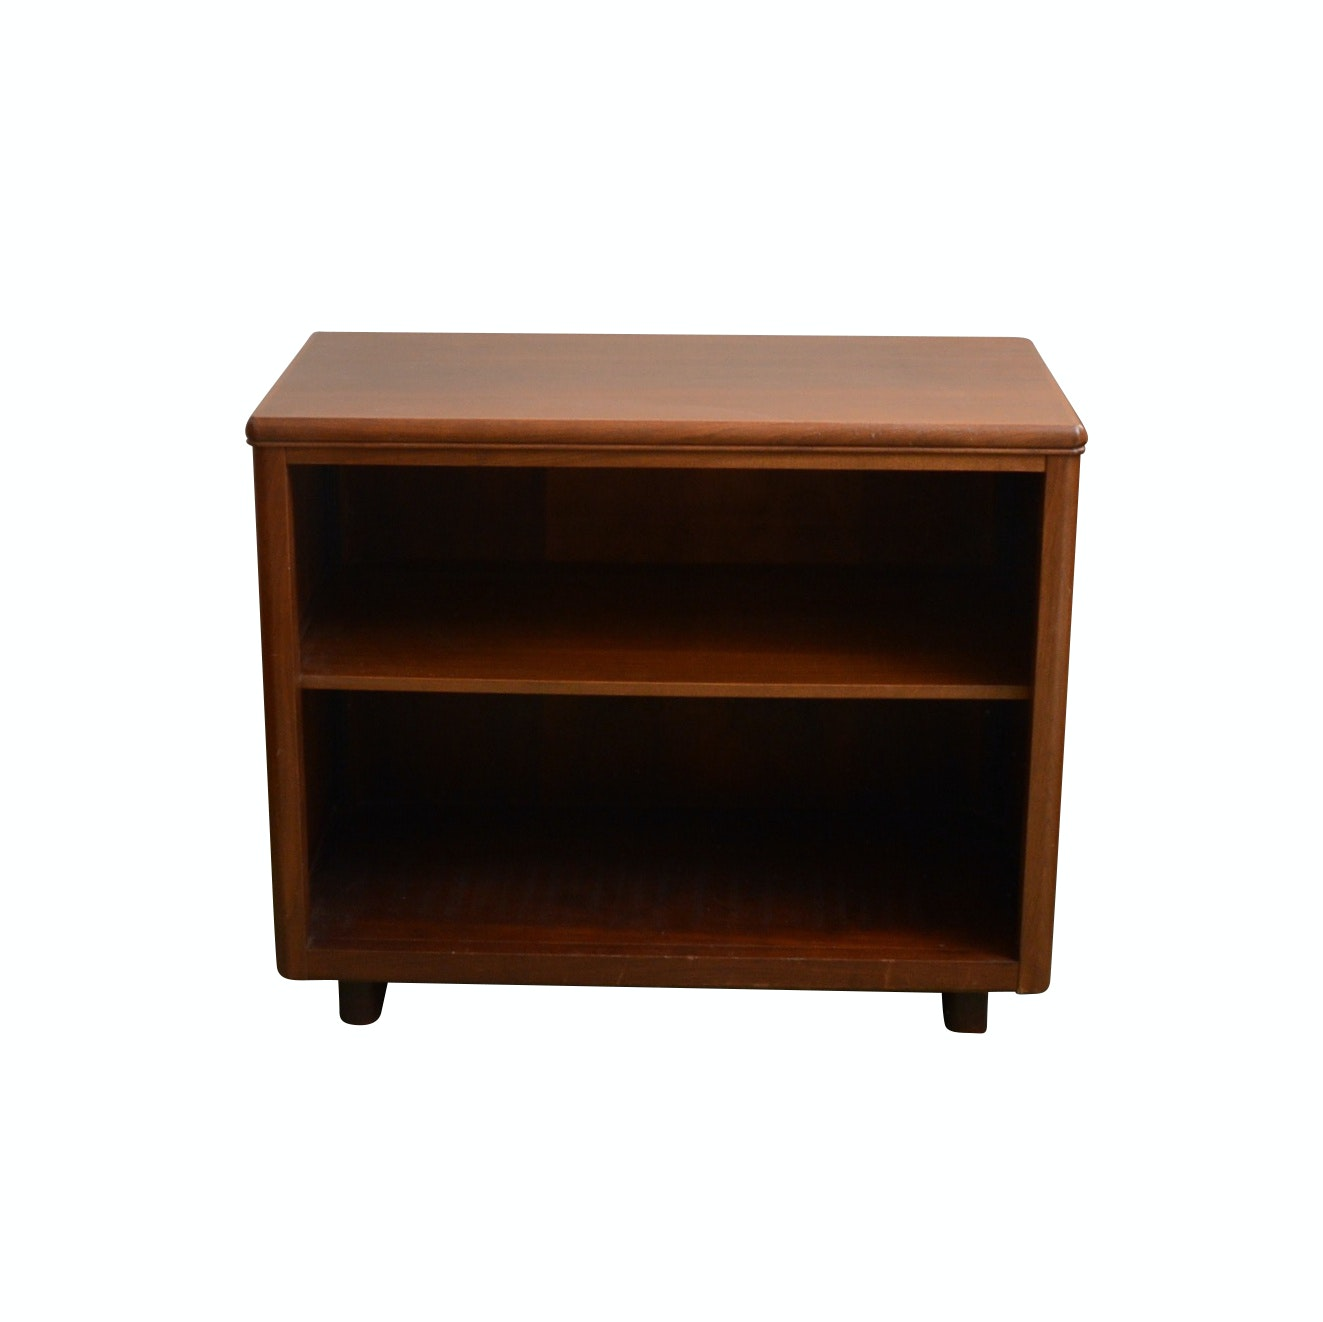 Teak Wood Bookshelf